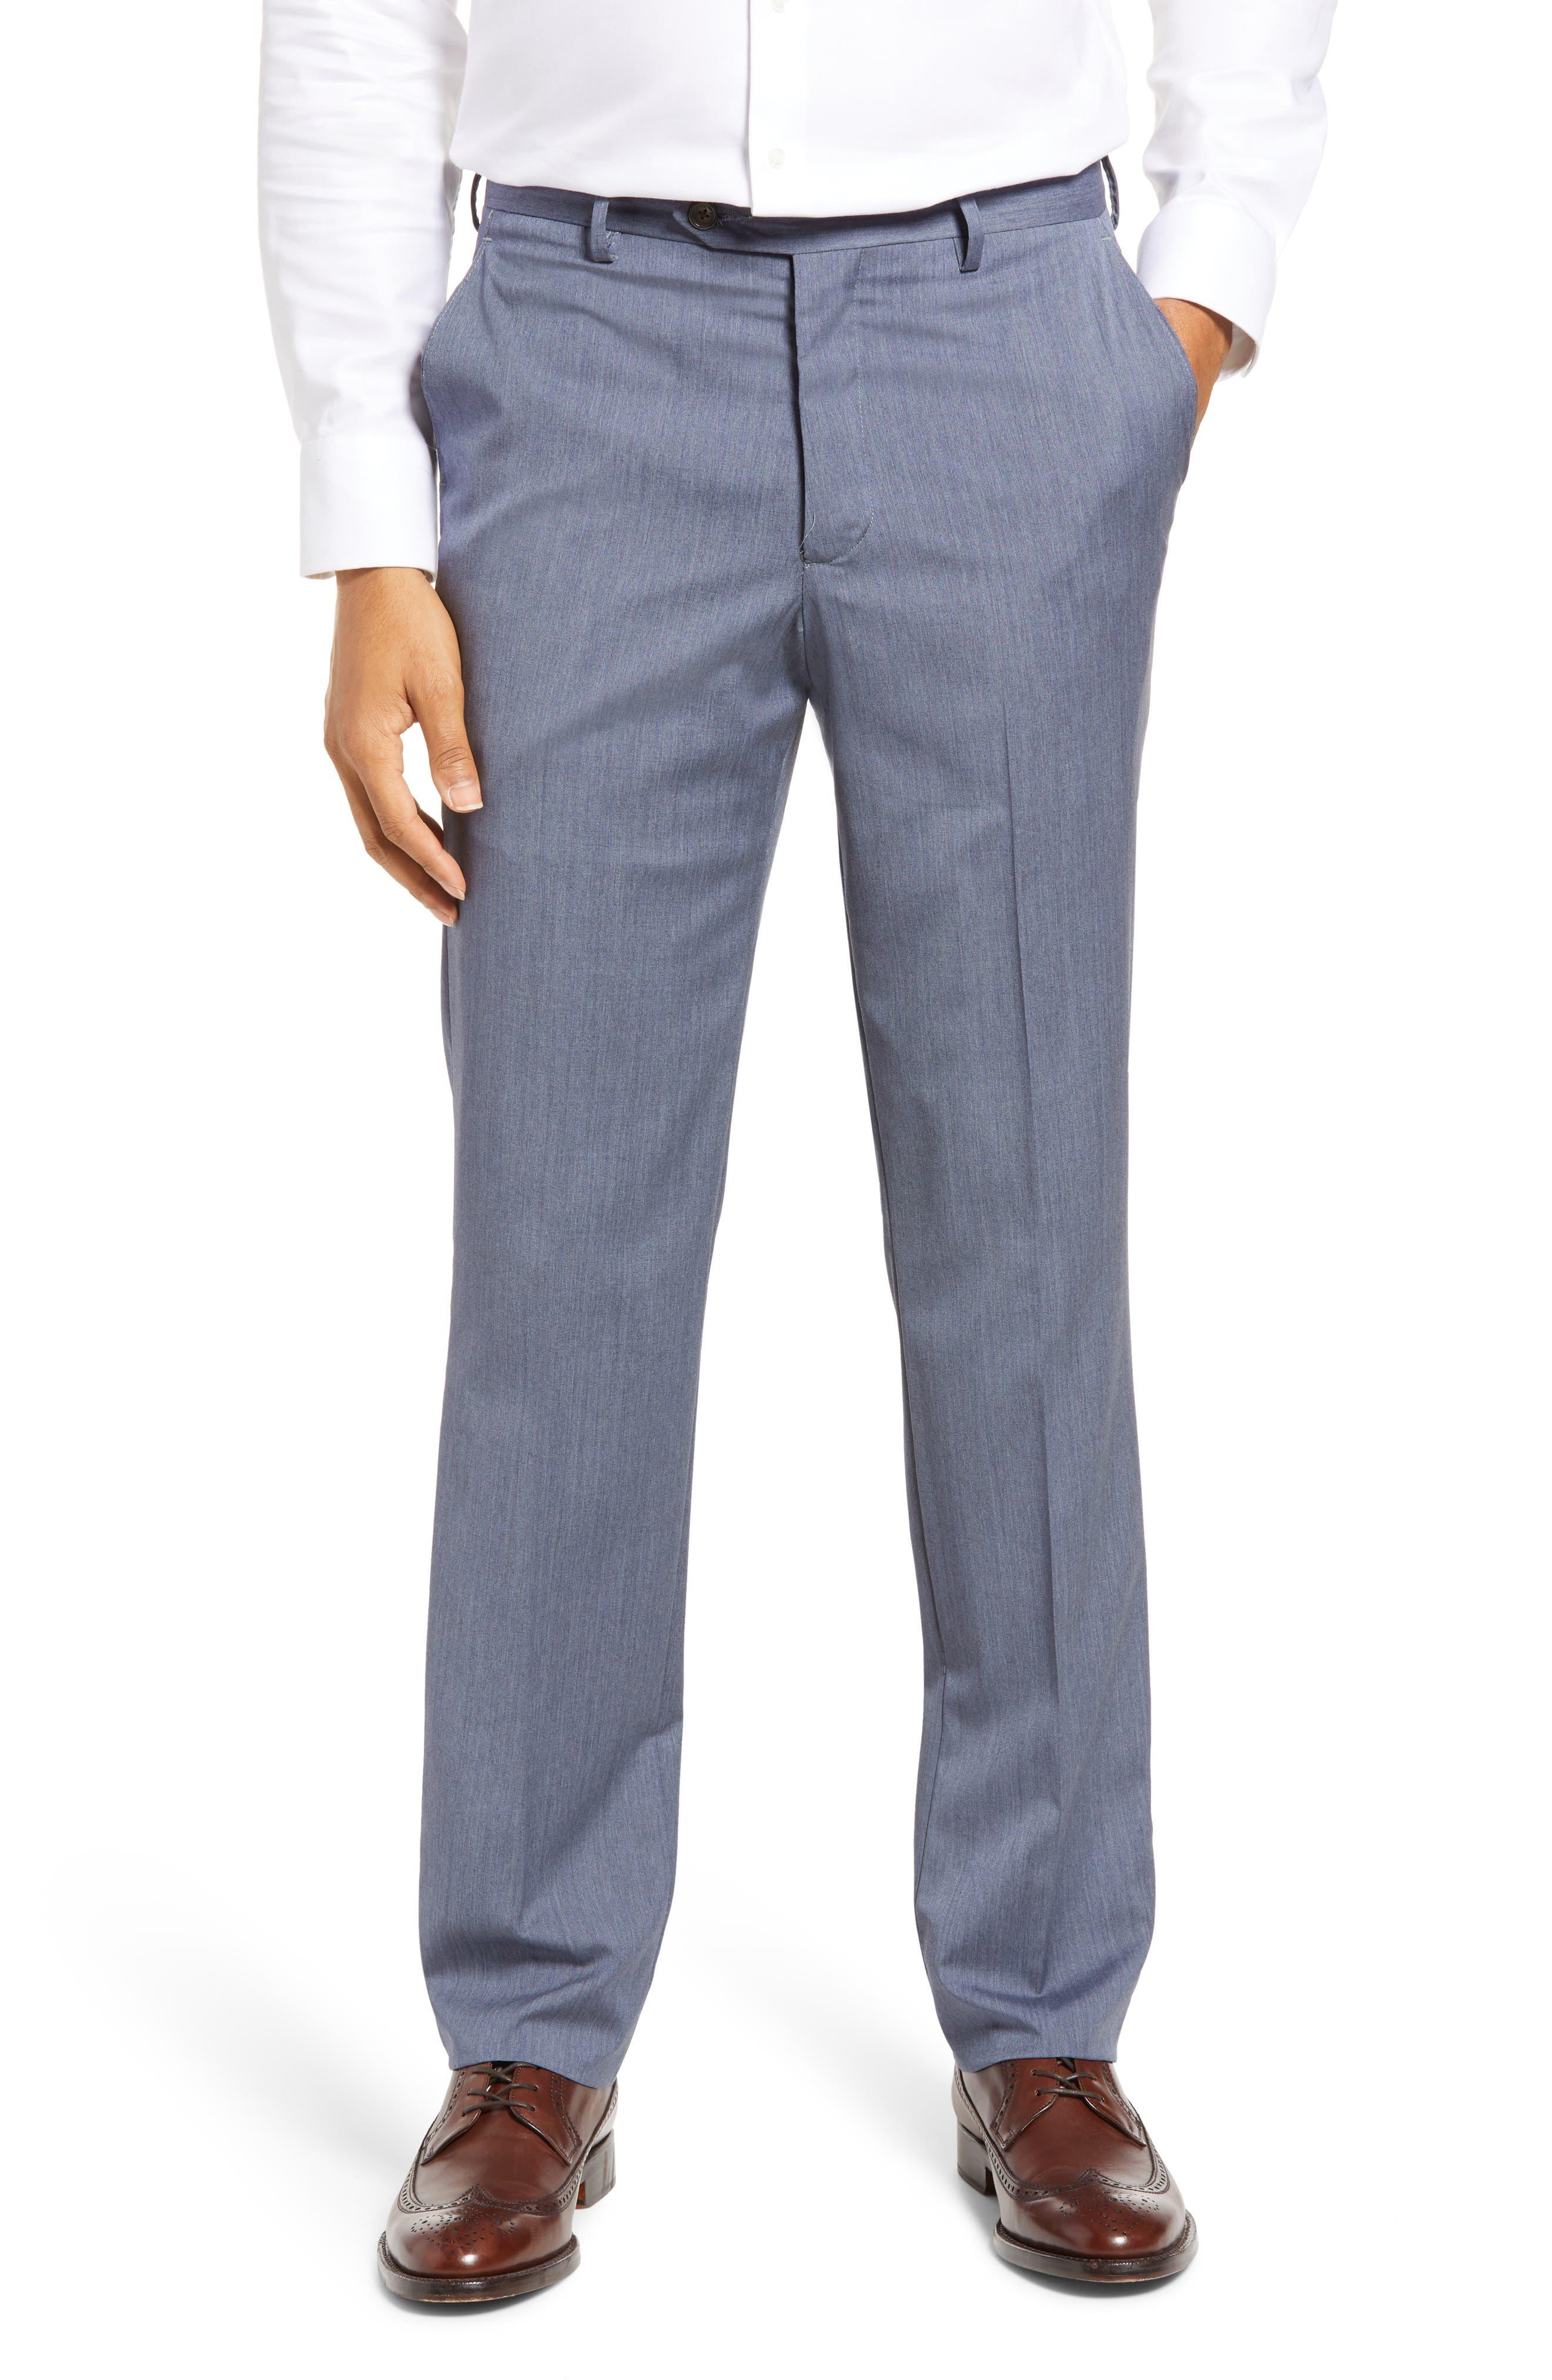 Flat Front Wool Dress Pants